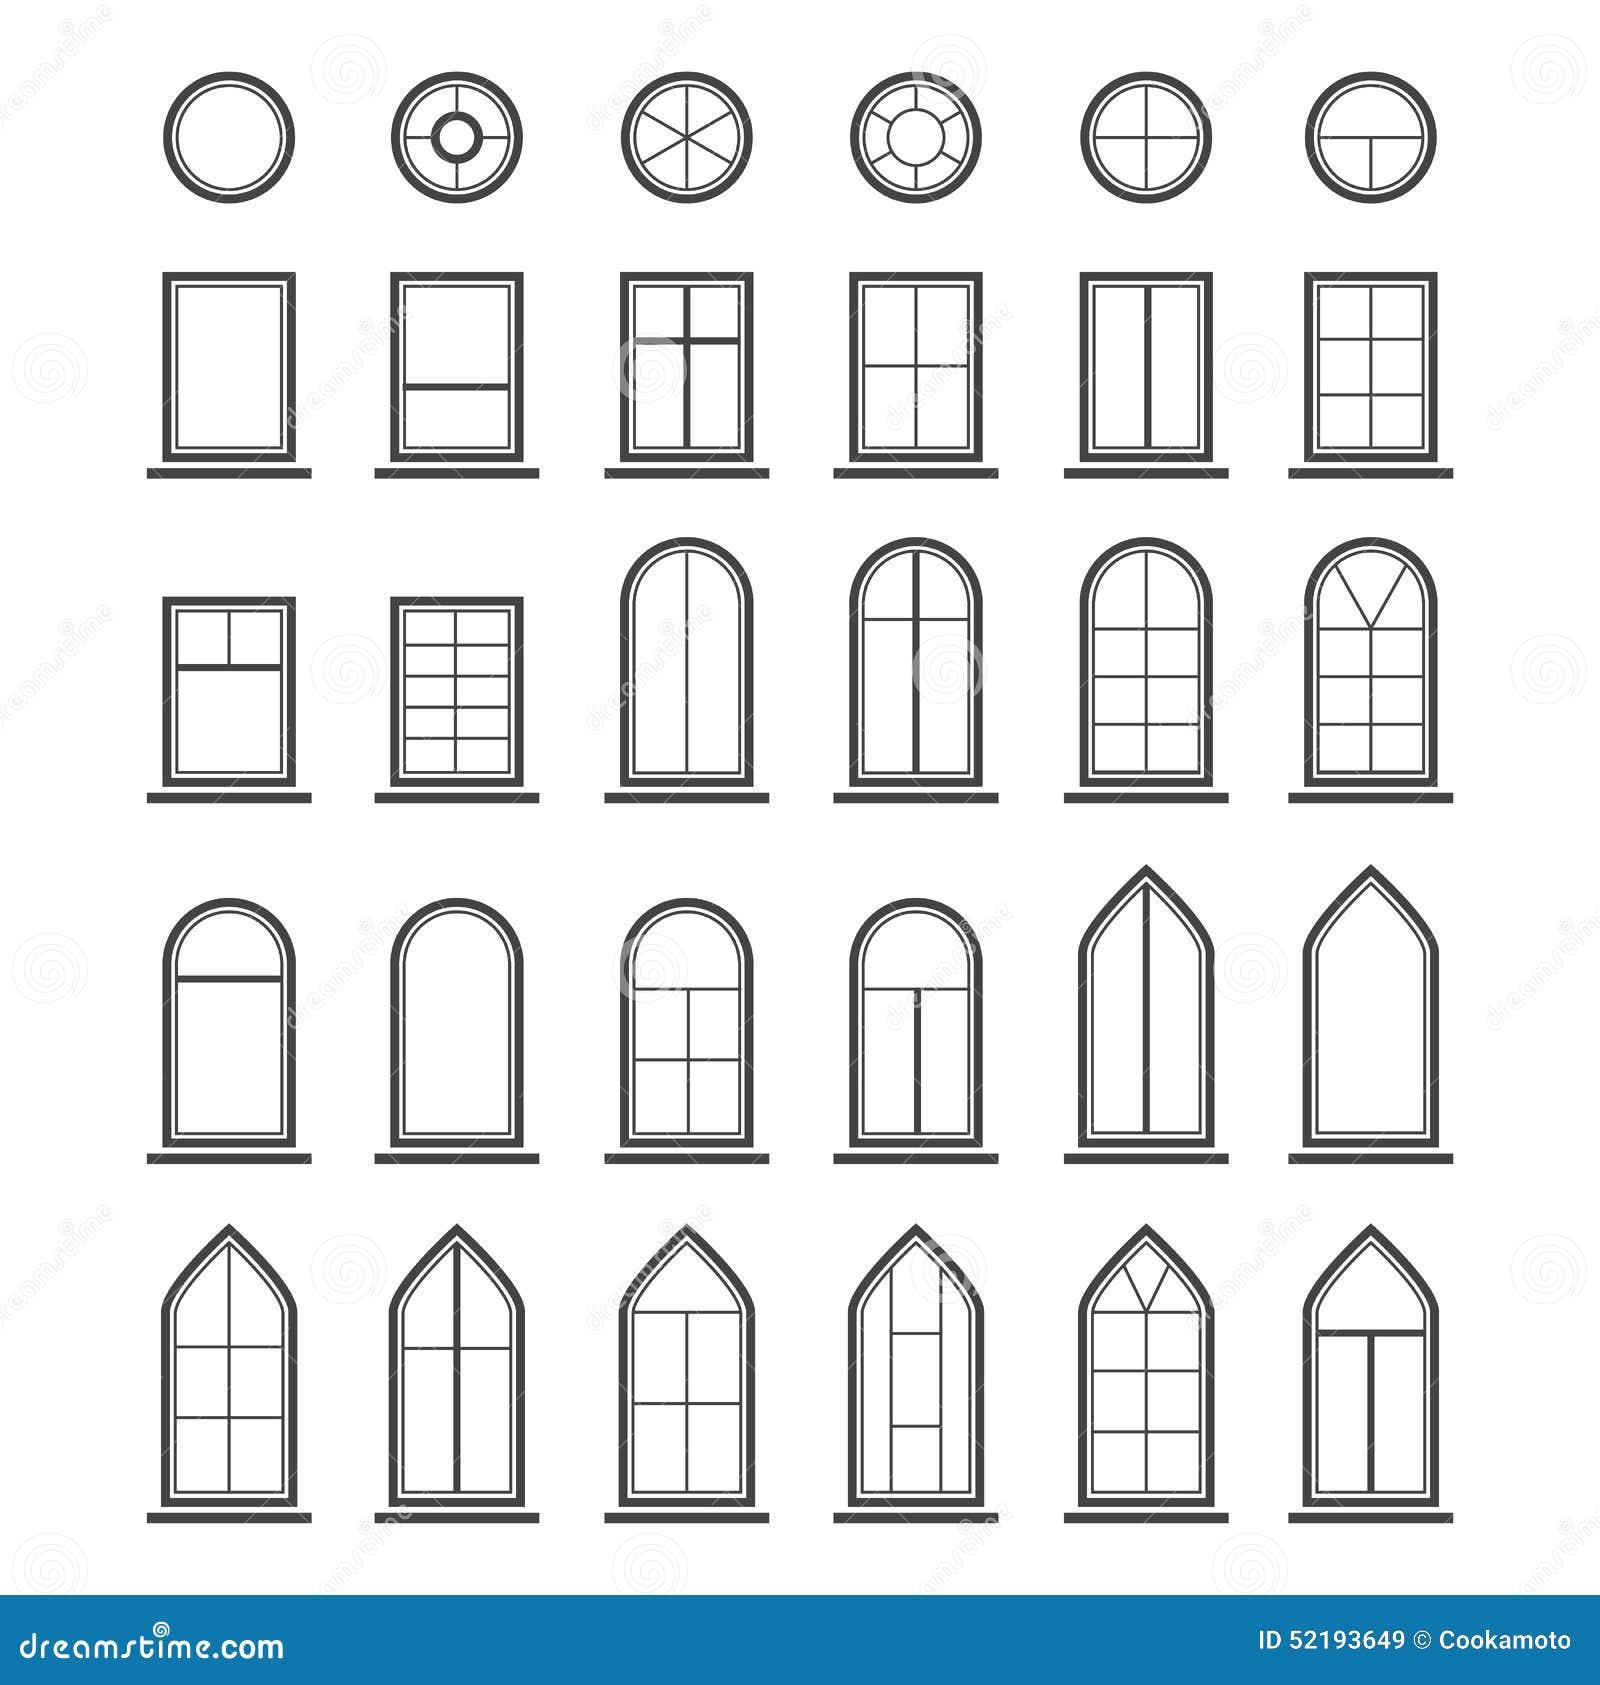 Types Of Windows Stock Illustration - Image: 59876750